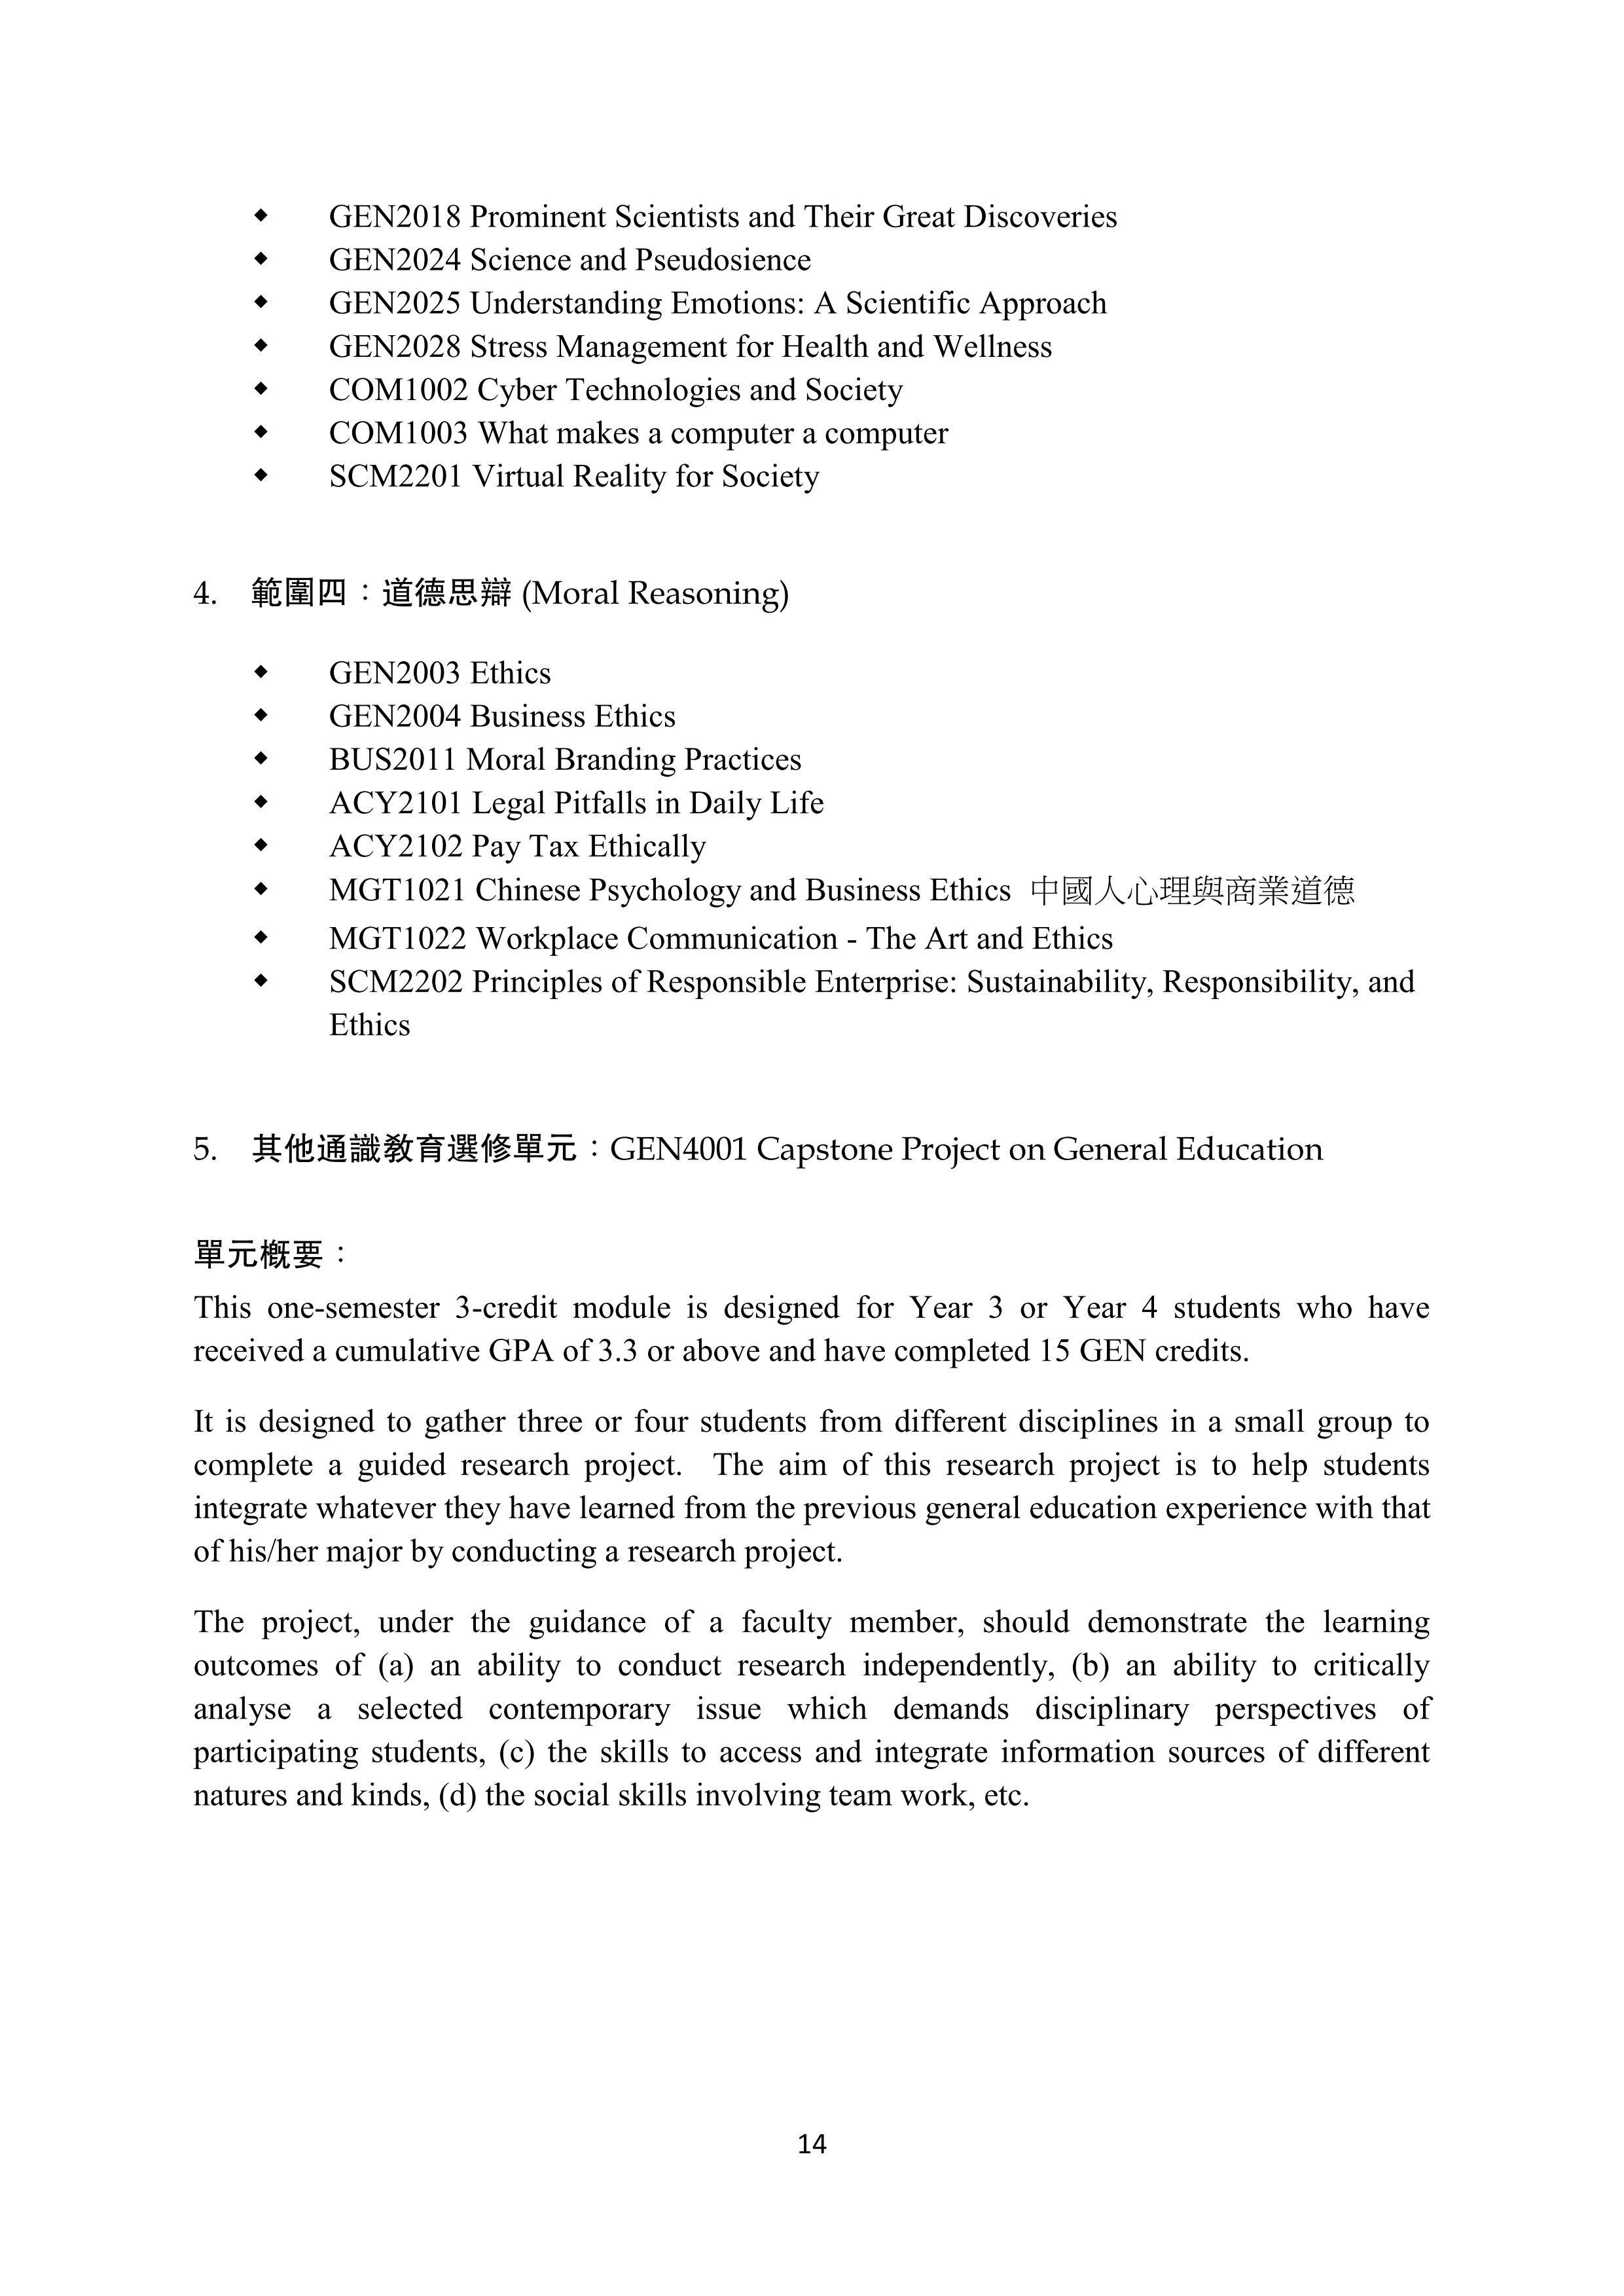 BA-CHI Programme Handbook-2018-19_16